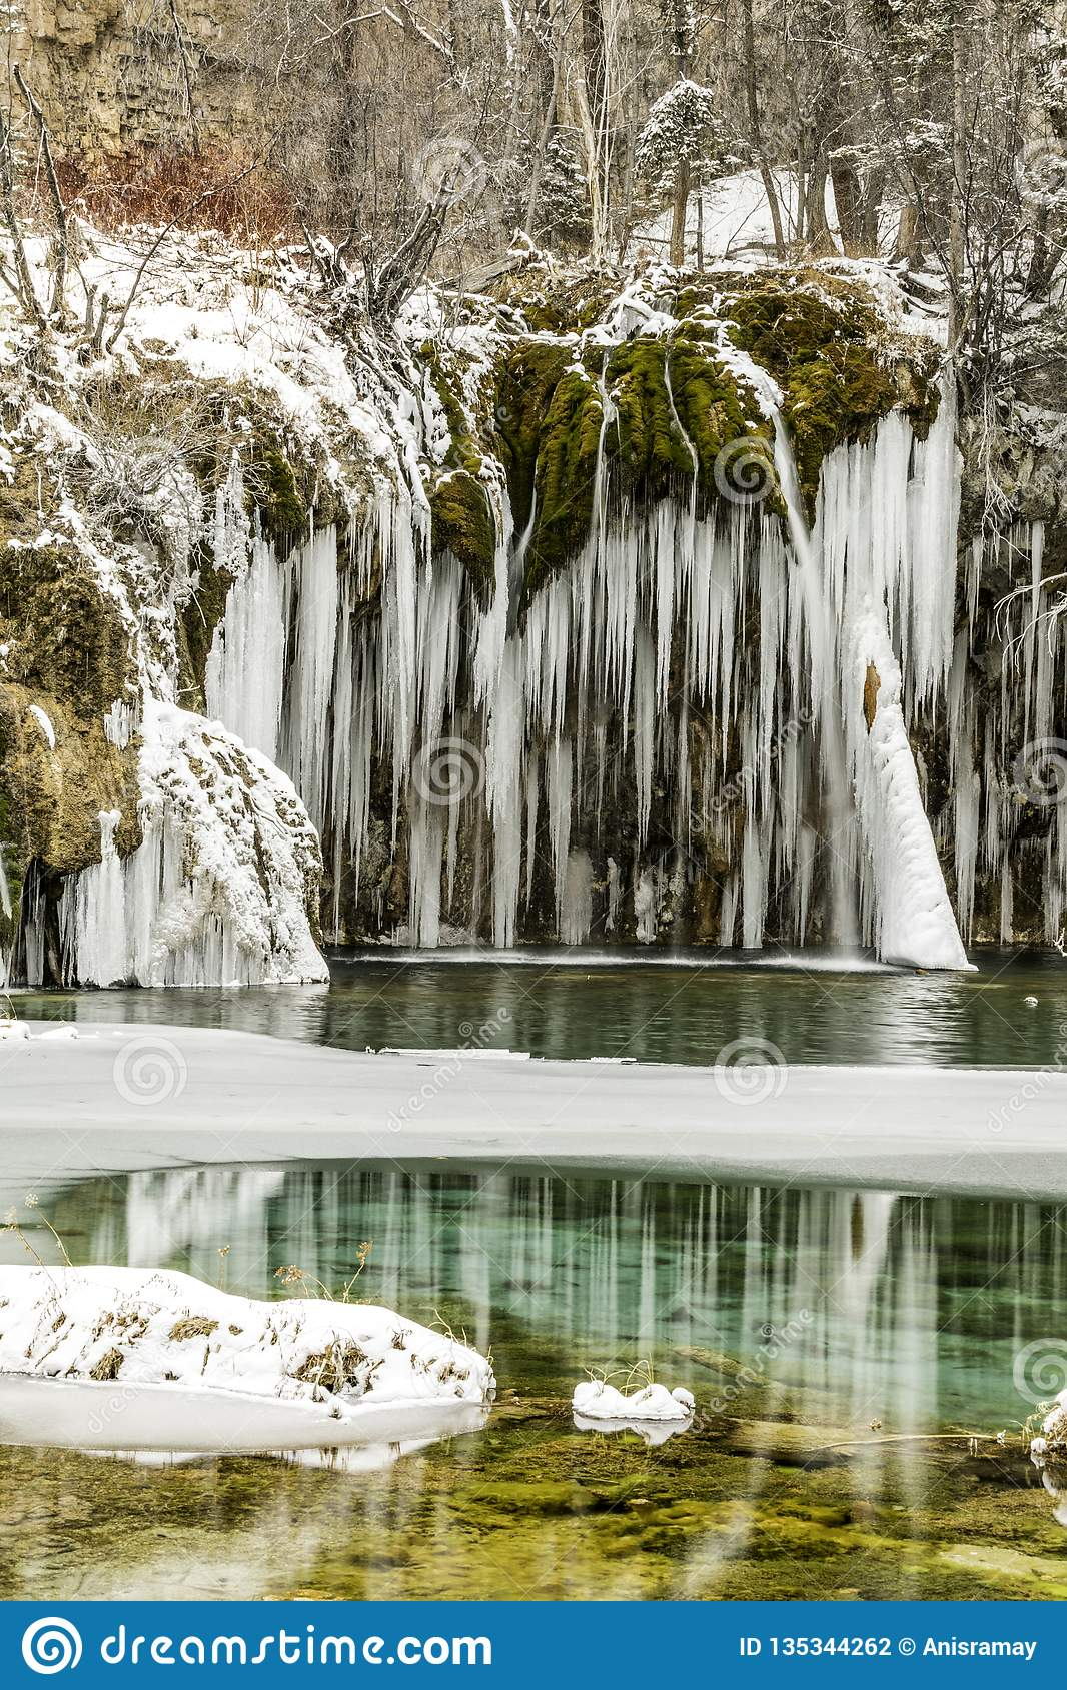 Inverno, neve, frio, lago congelado, Colorado, co, lago escondido